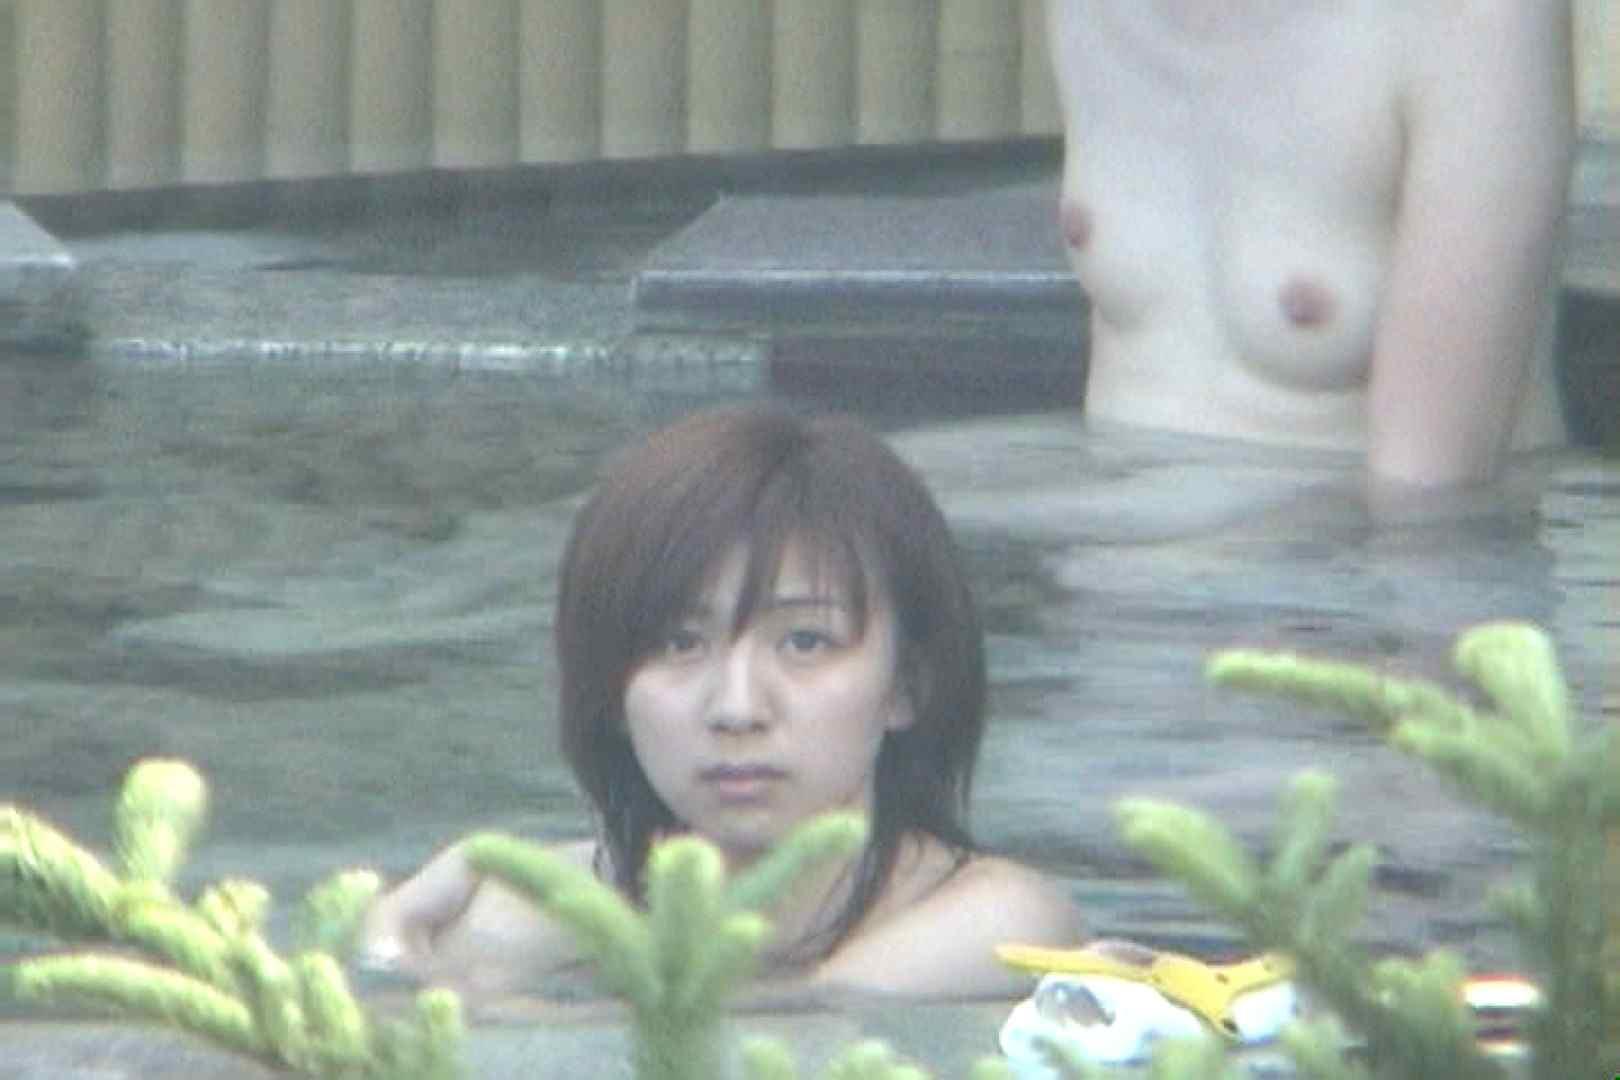 Aquaな露天風呂Vol.77【VIP限定】 美しいOLの裸体   露天風呂突入  96pic 64